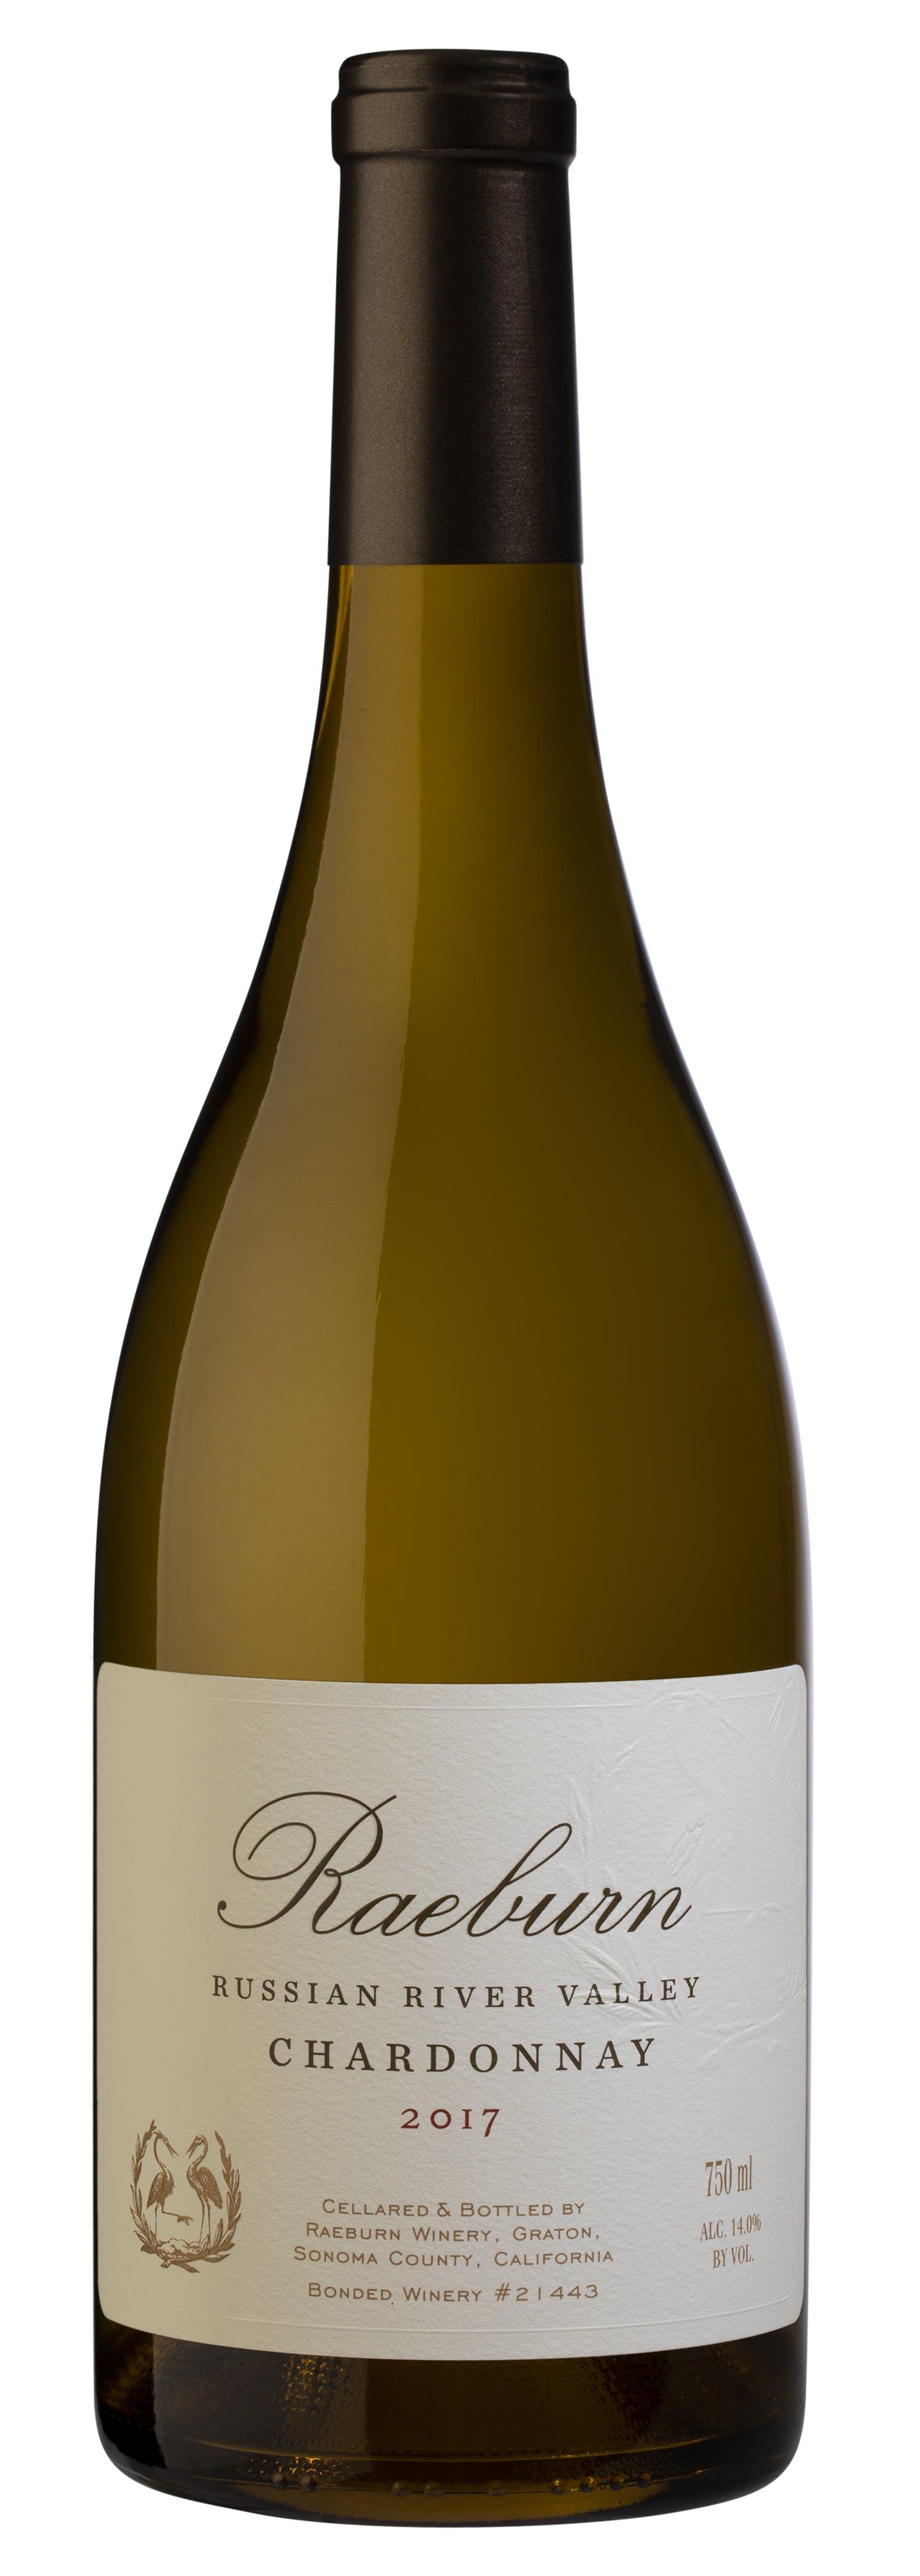 Raeburn Russian River Chardonnay 2017 The Vineyard